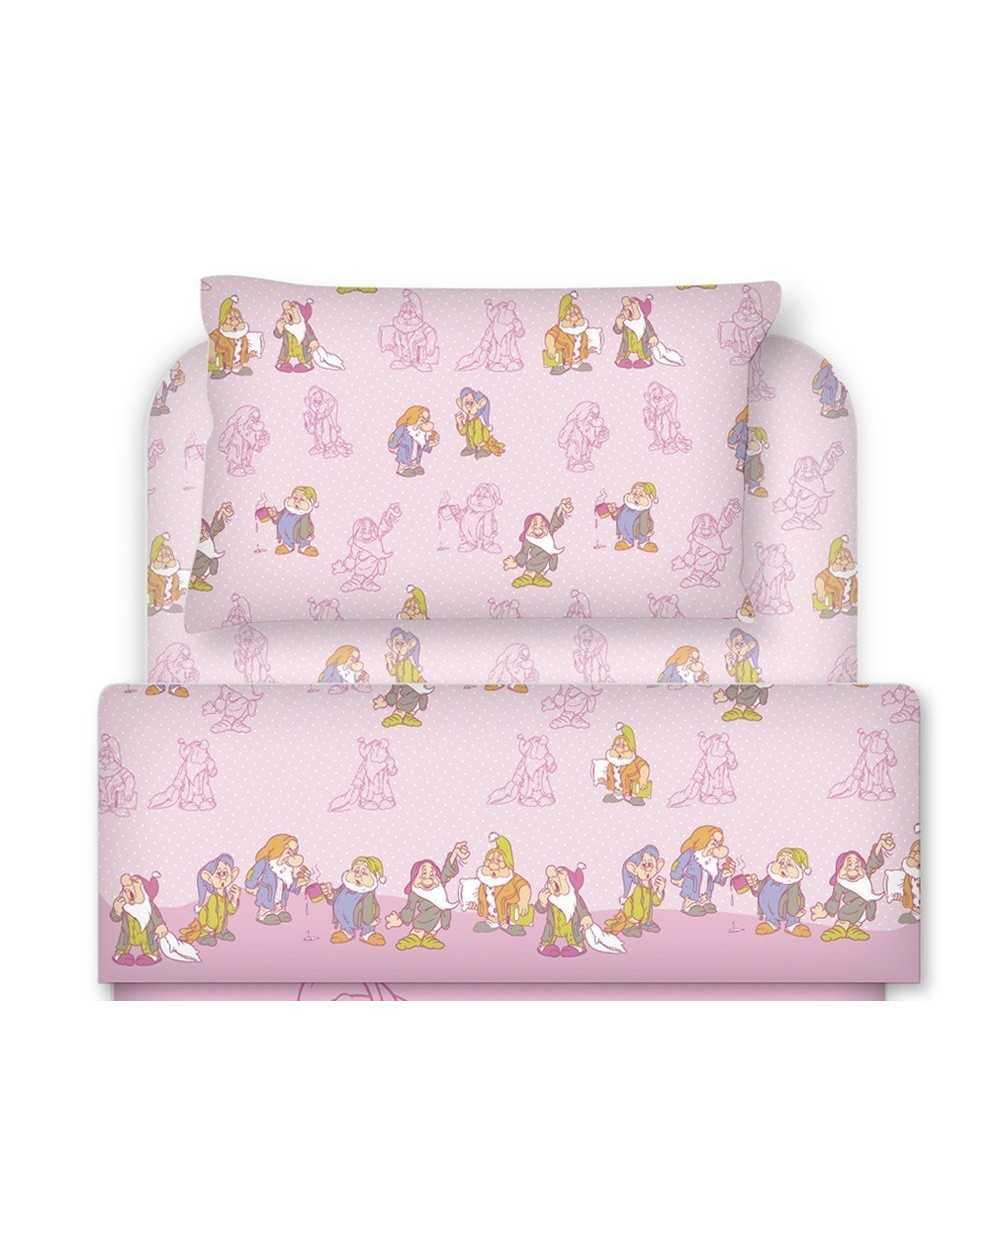 linge de lit b b set de draps les sept nains rasoline l f d home. Black Bedroom Furniture Sets. Home Design Ideas